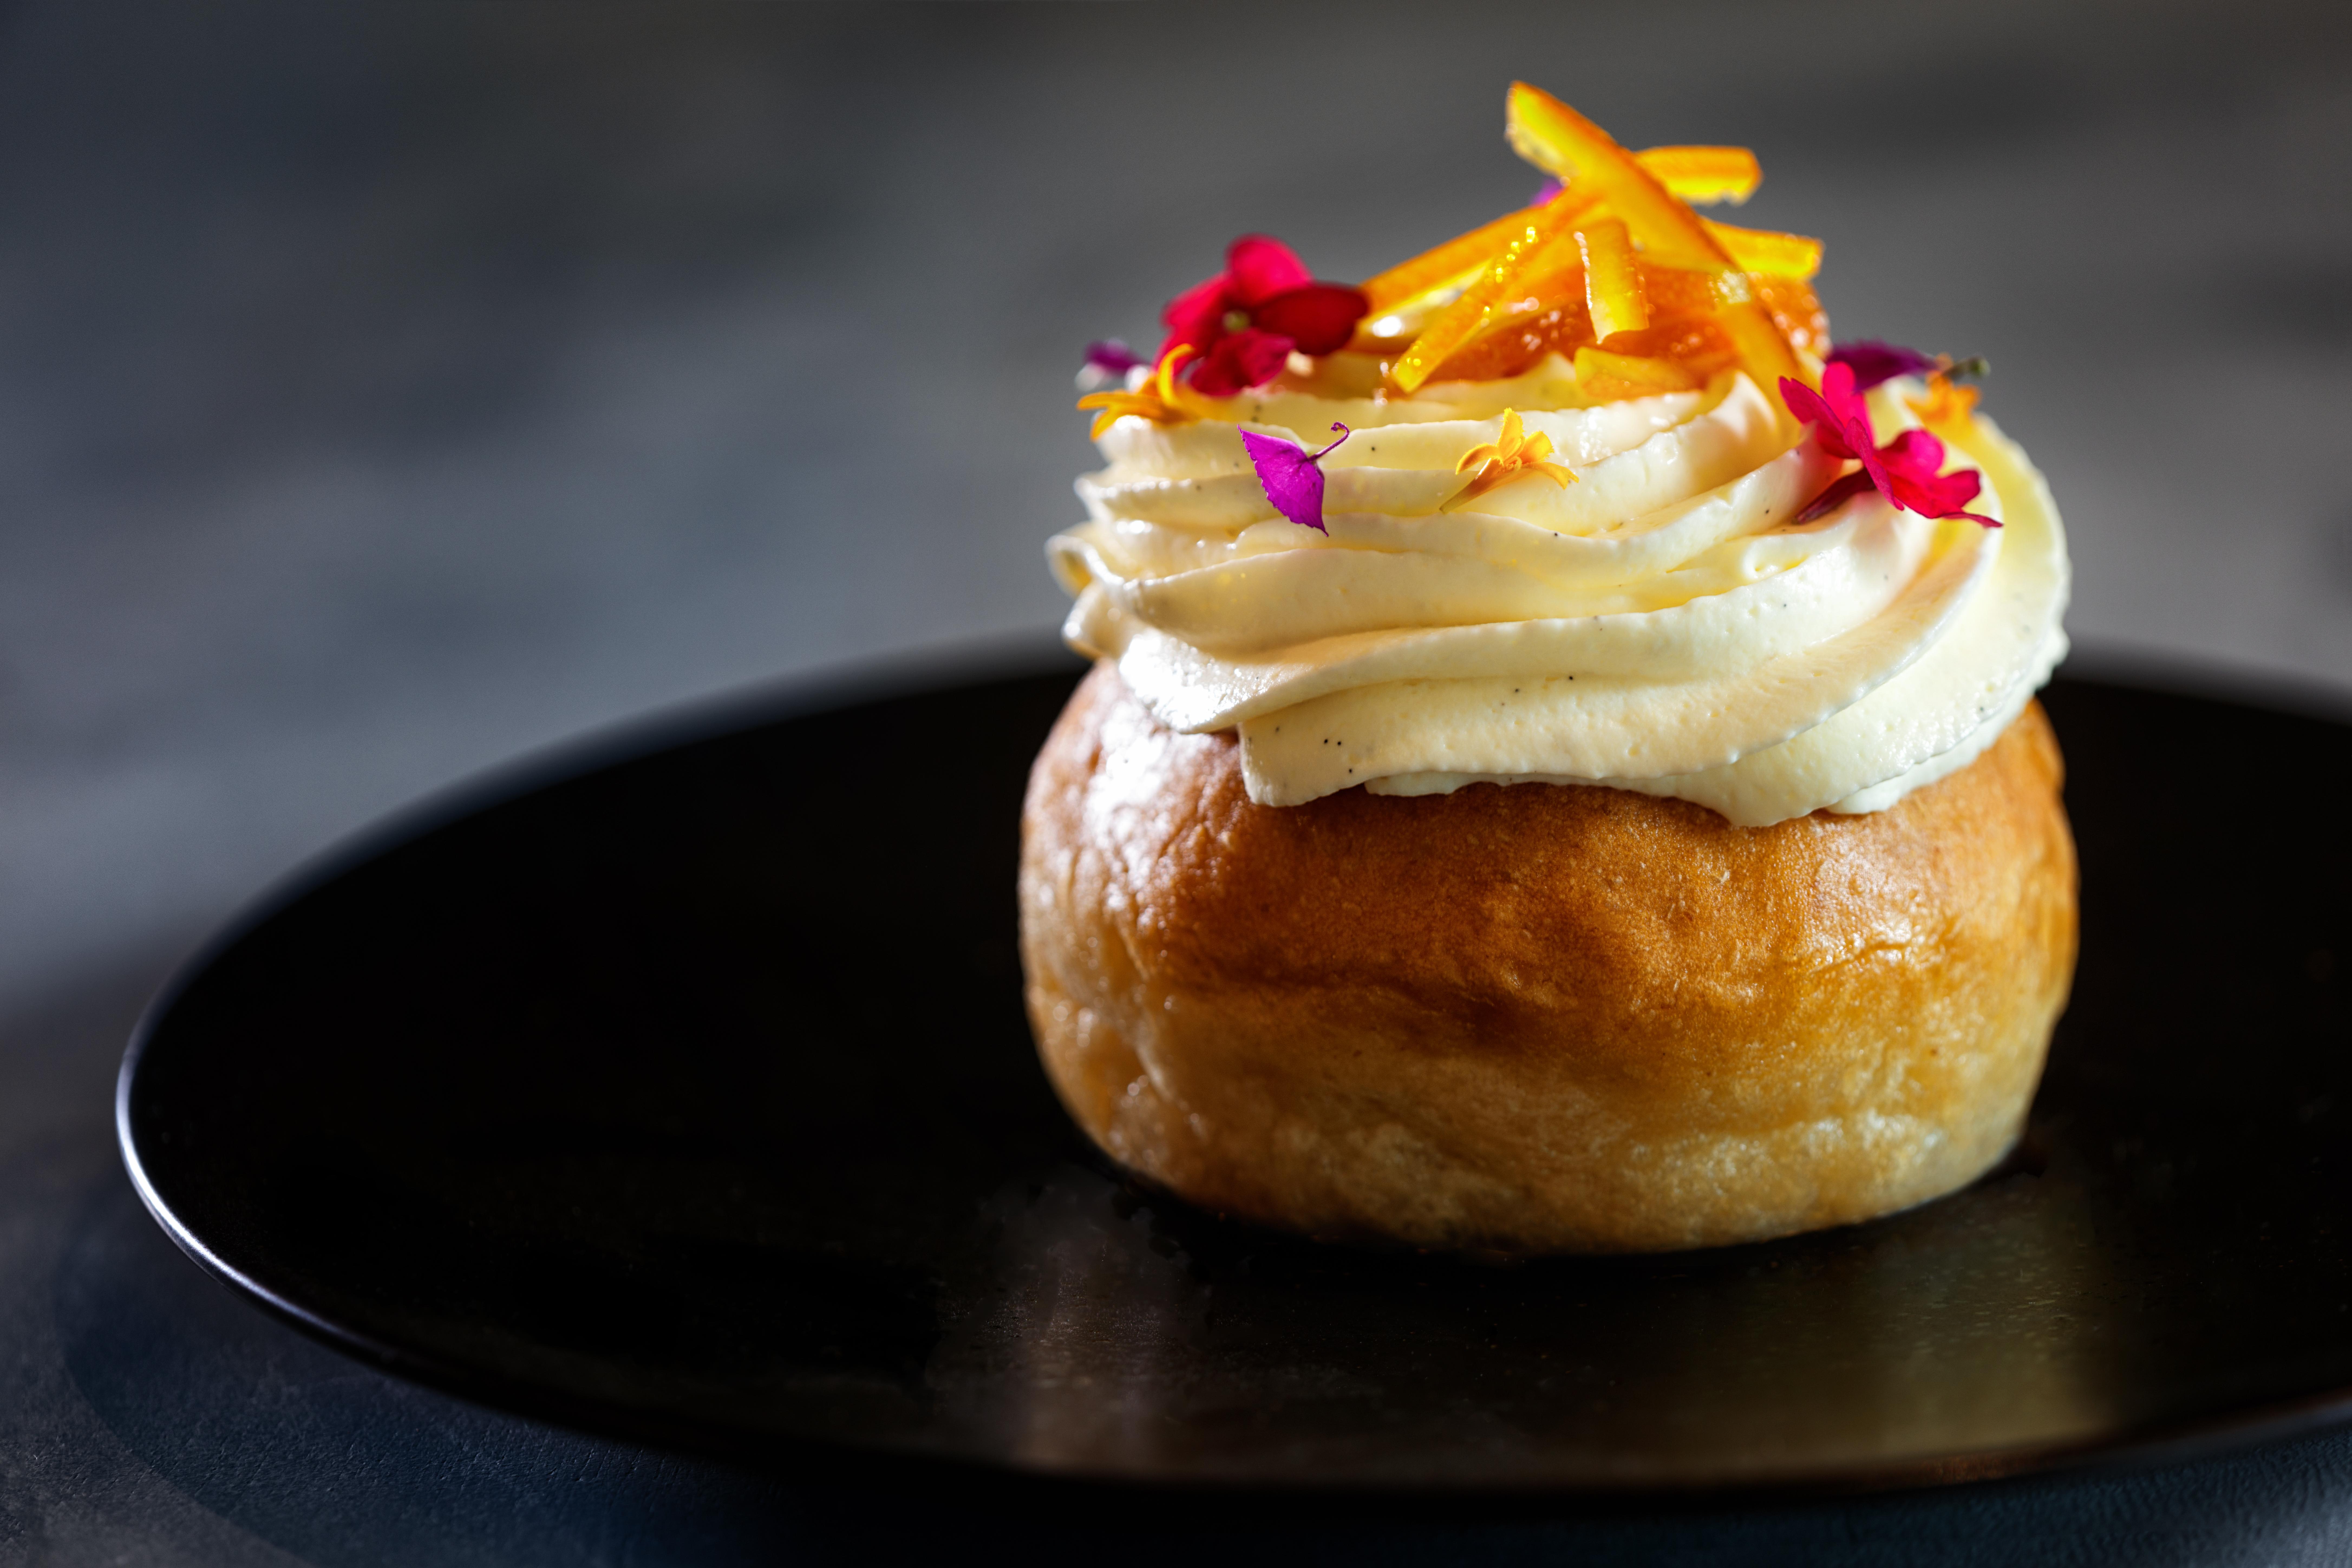 Novikov_Desserts (1 of 4)